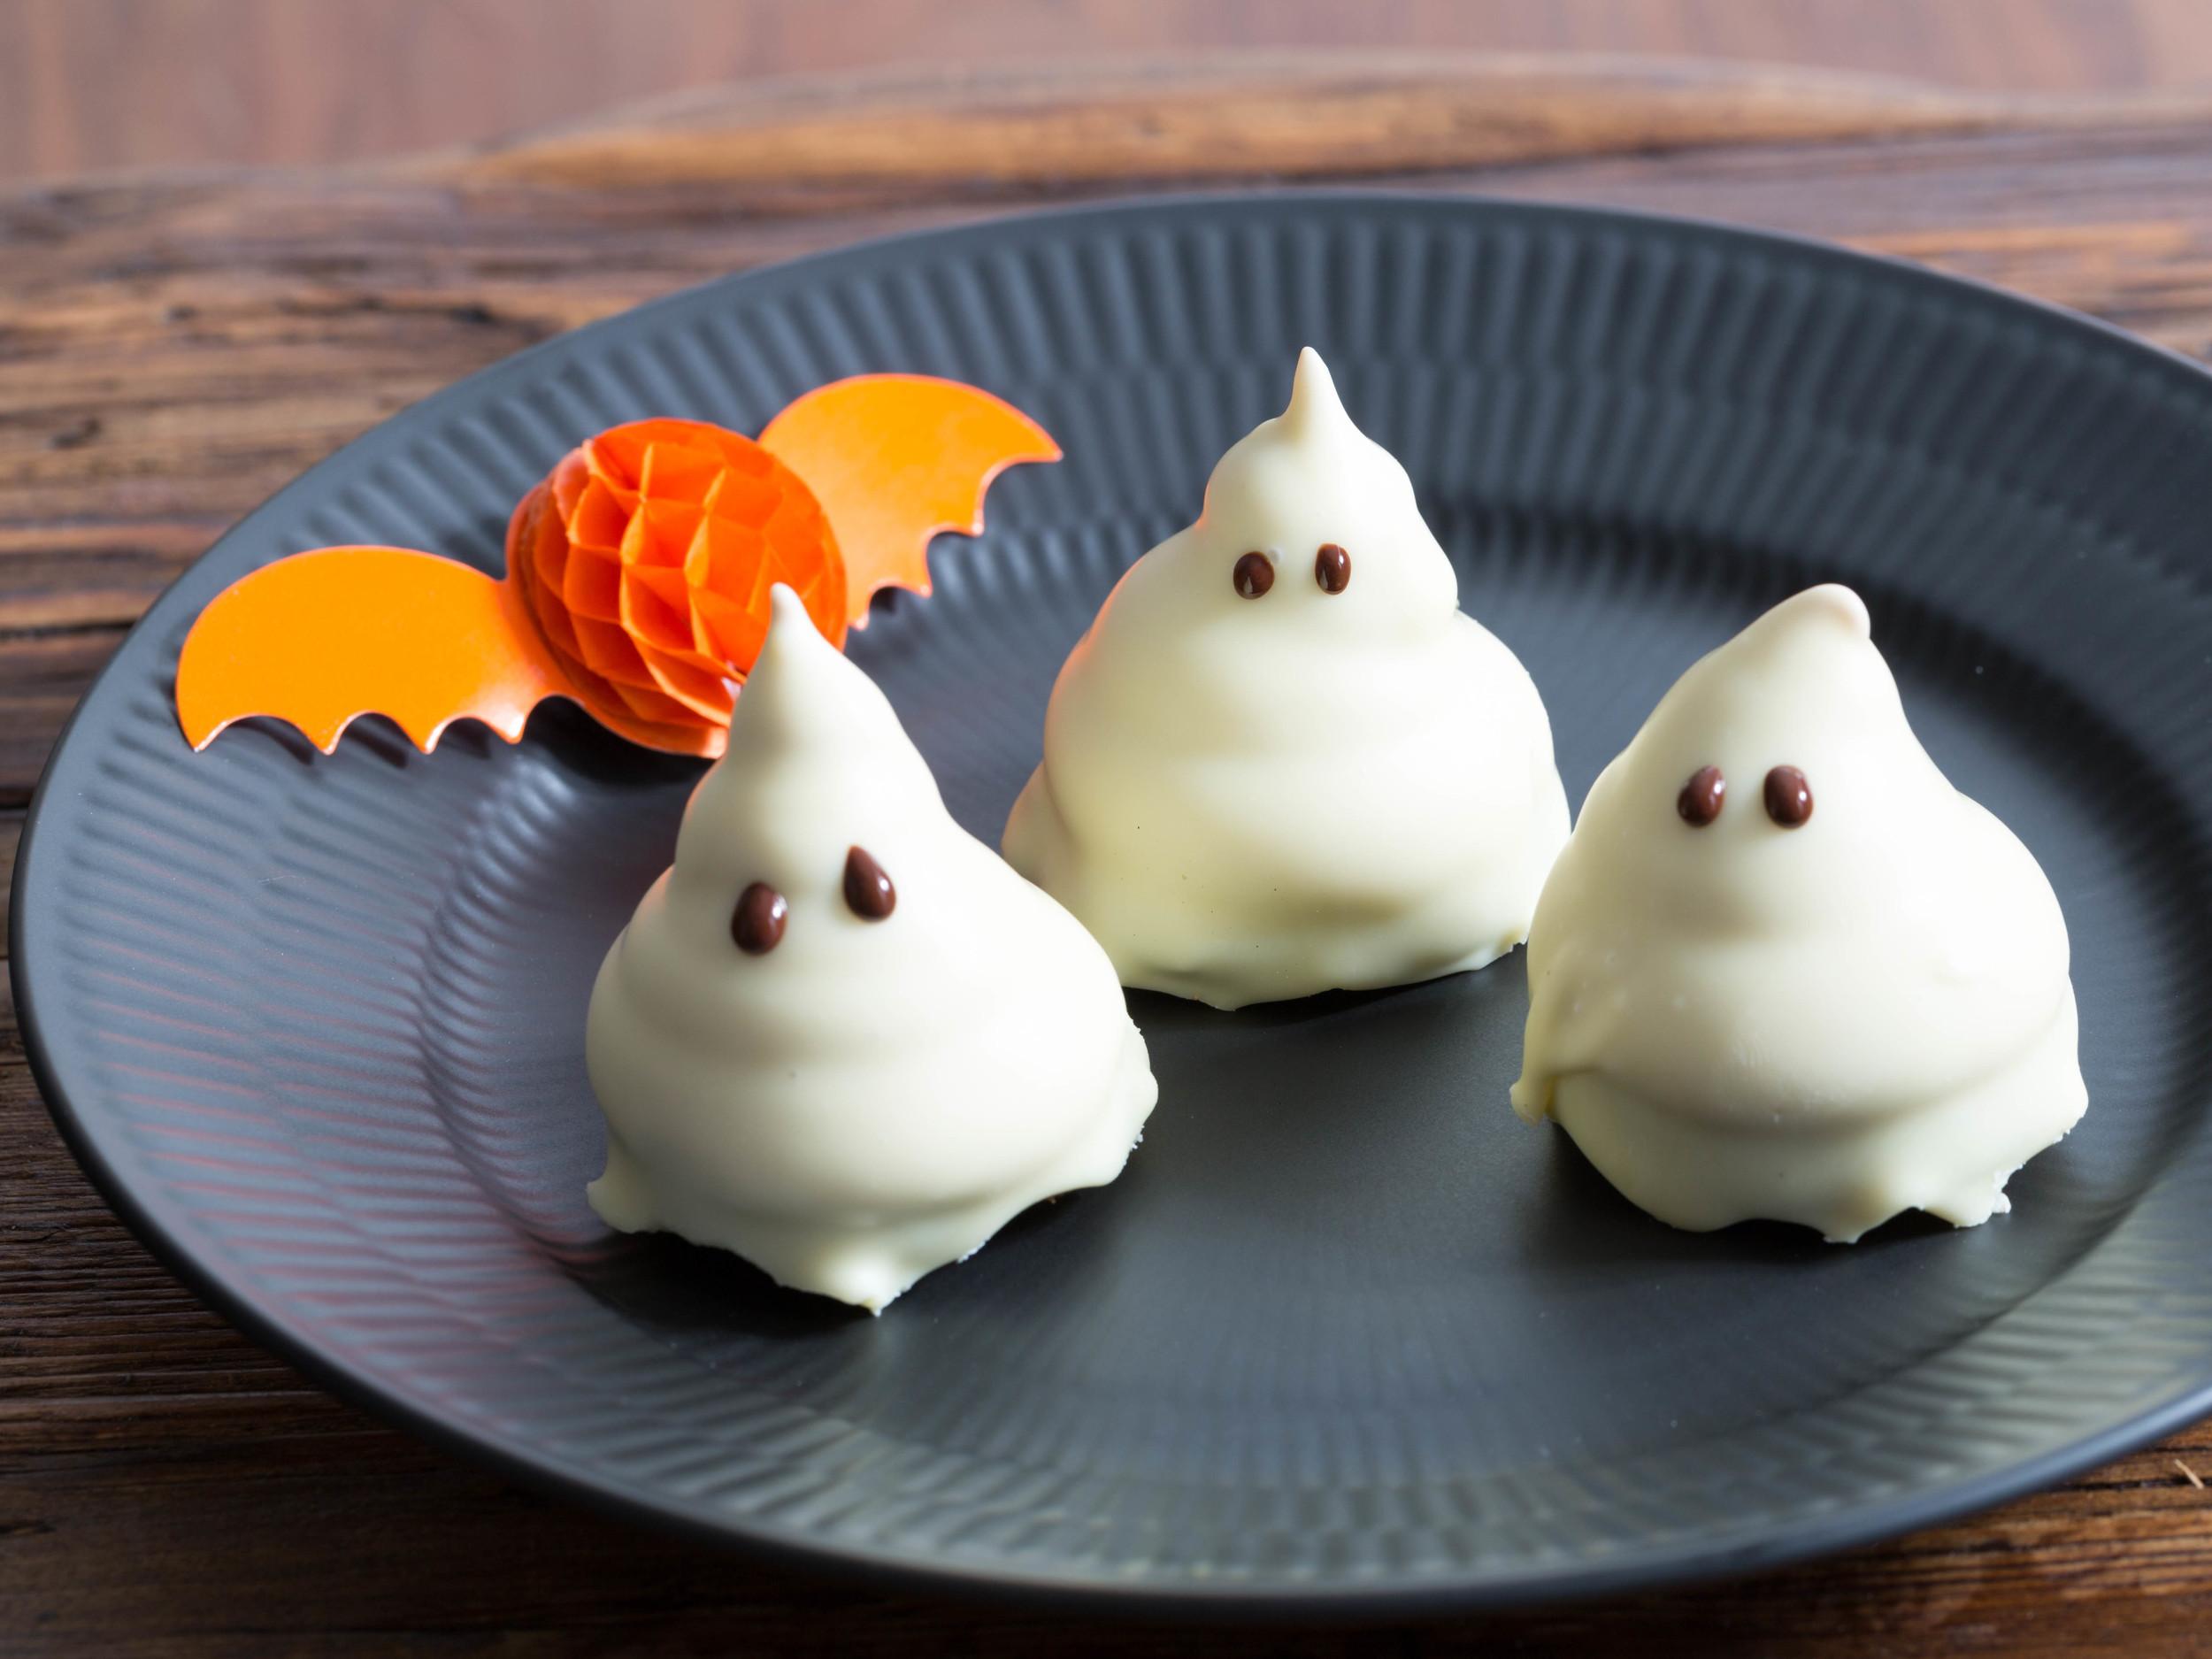 Liquorice Ghosts aka Liquorice Cream Puffs